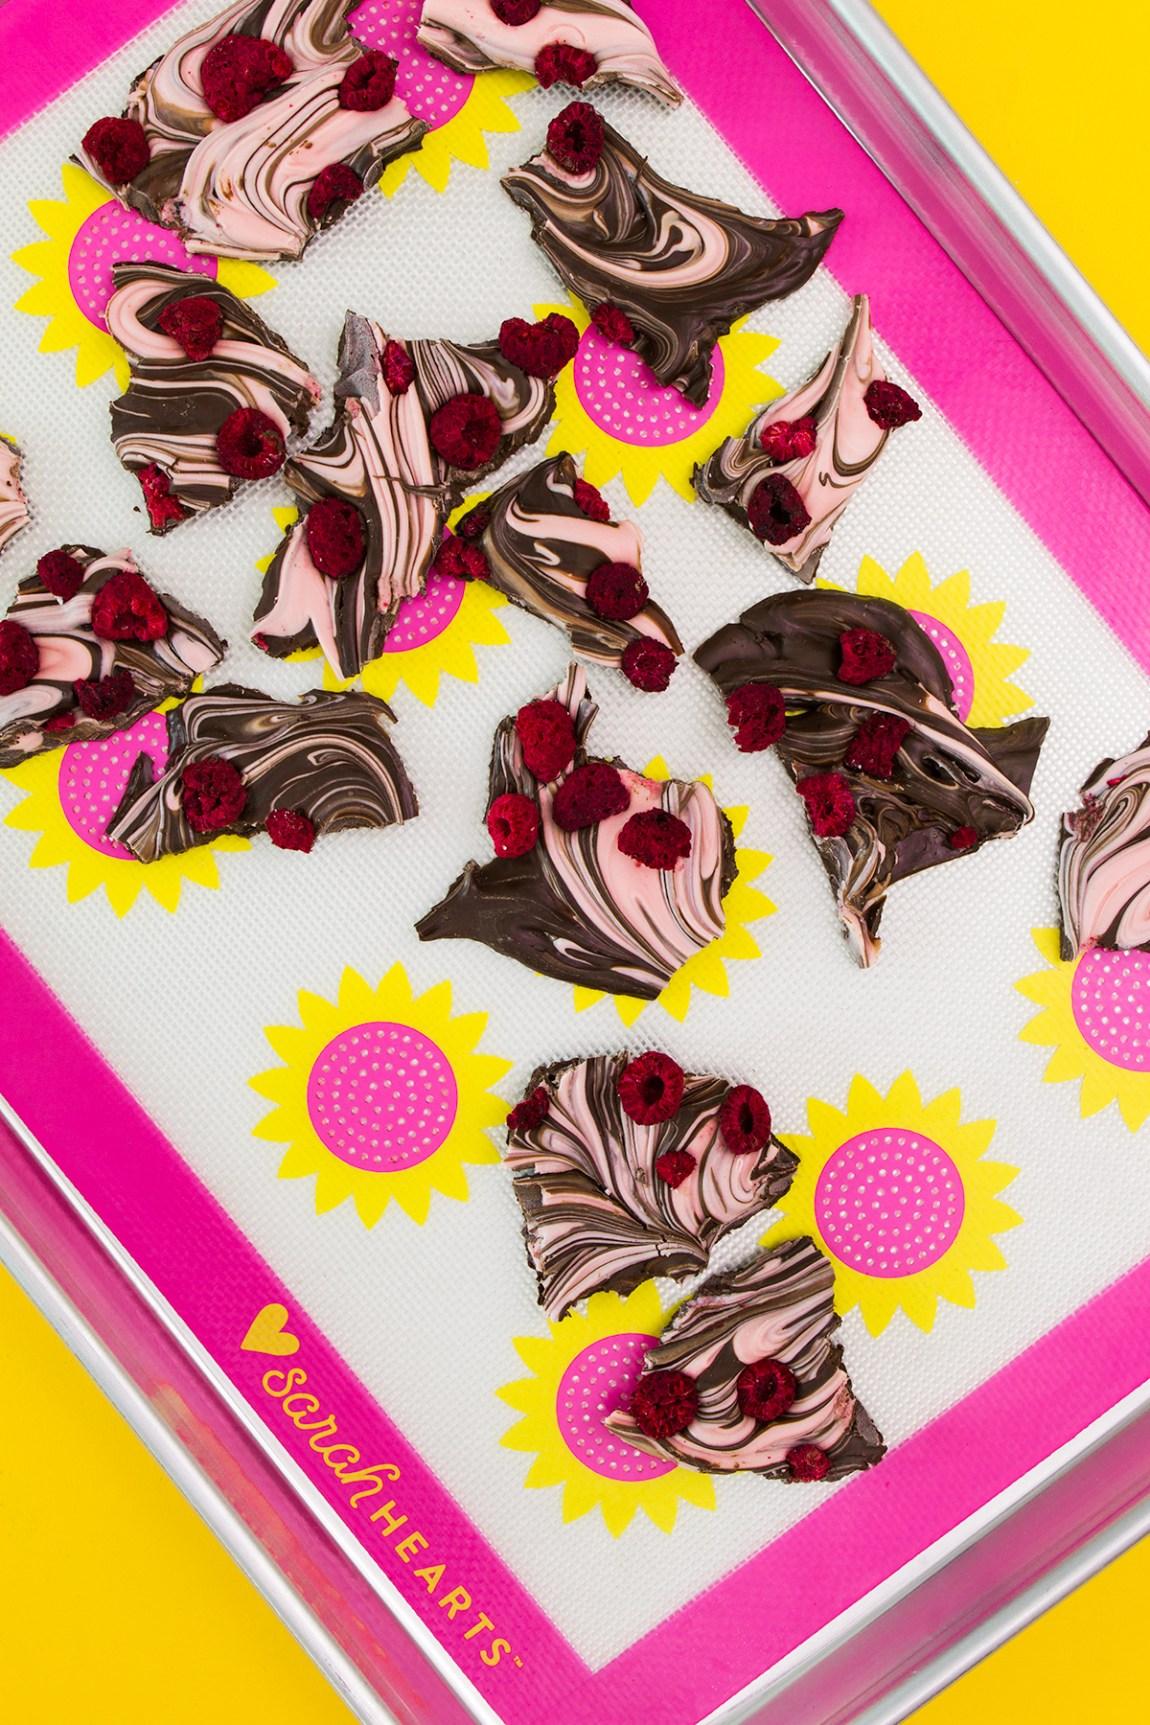 Make your valentine something sweet. Try this easy 4 ingredient raspberry dark chocolate bark recipe.